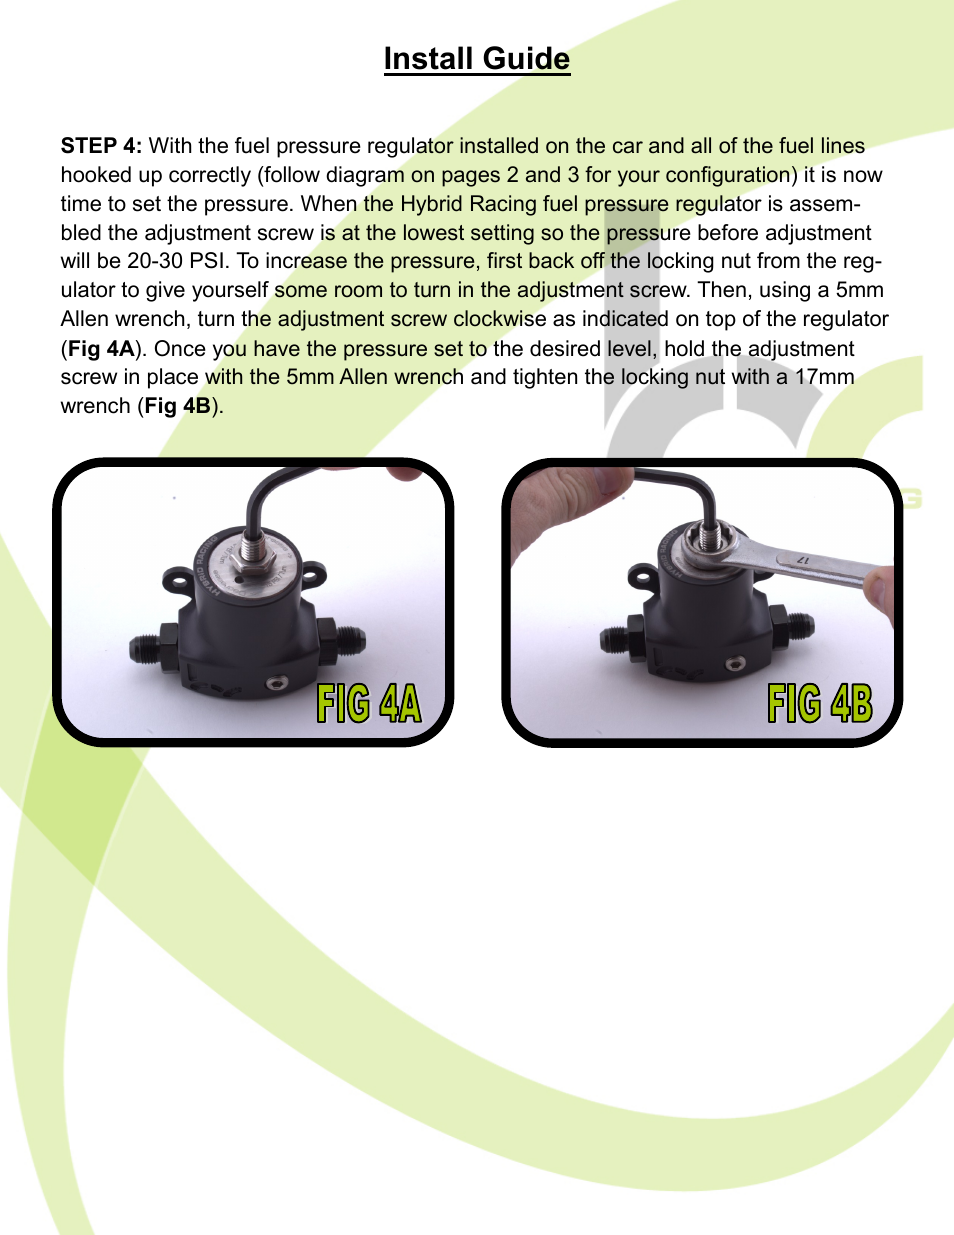 Install Guide Hybrid Racing Hr Unibody Fuel Pressure Regulator User Manual Page 6 7